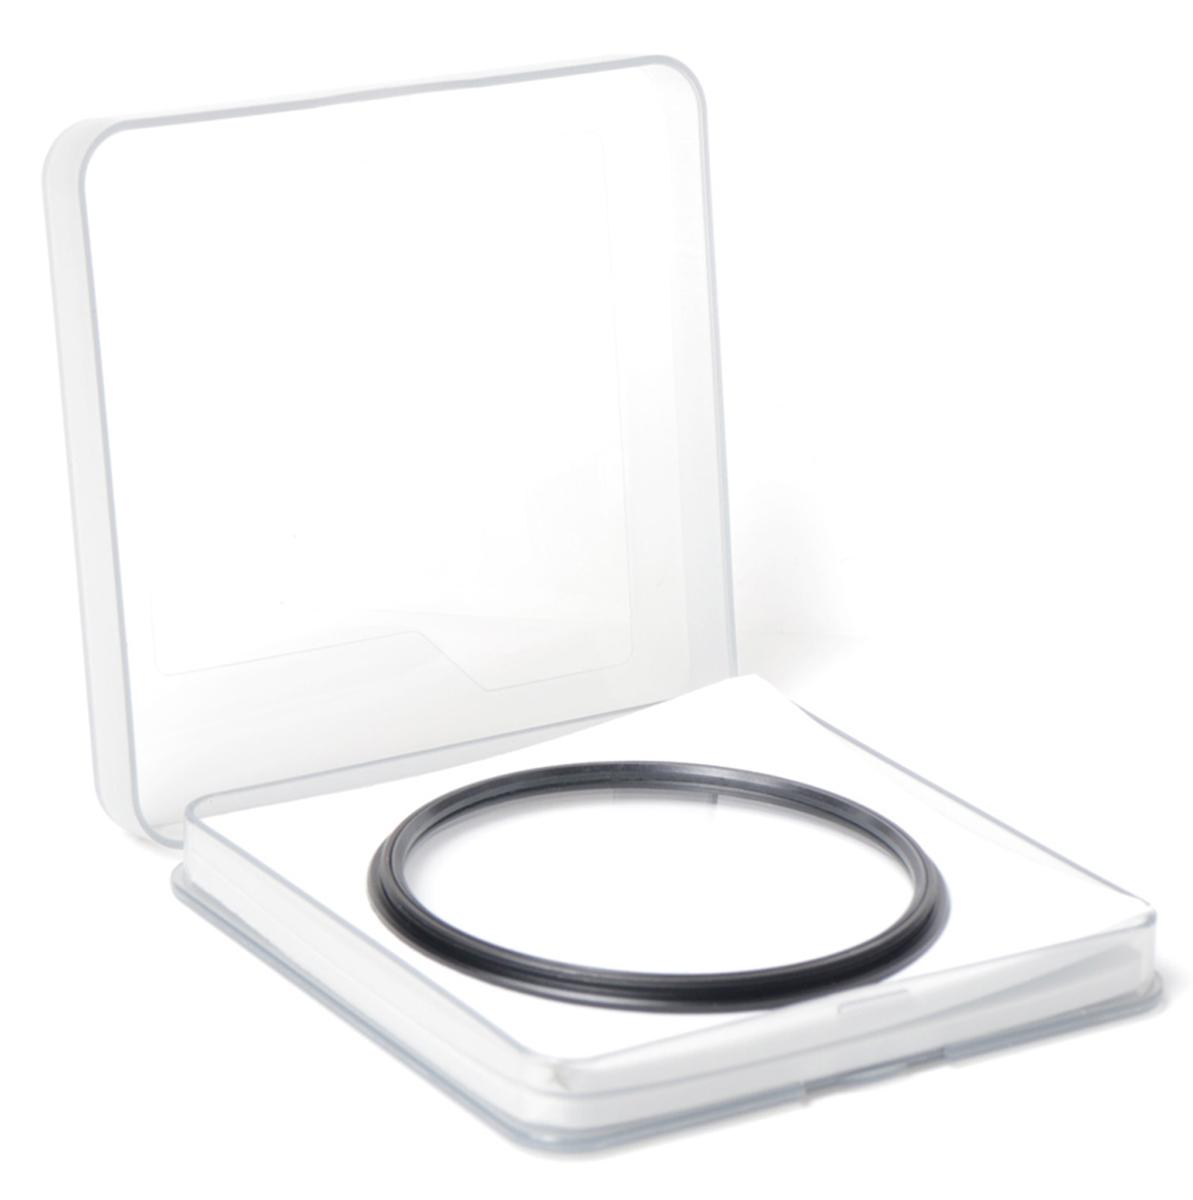 Fujimi UV М58мм, Black ультрафиолетовый фильтр (58 мм)